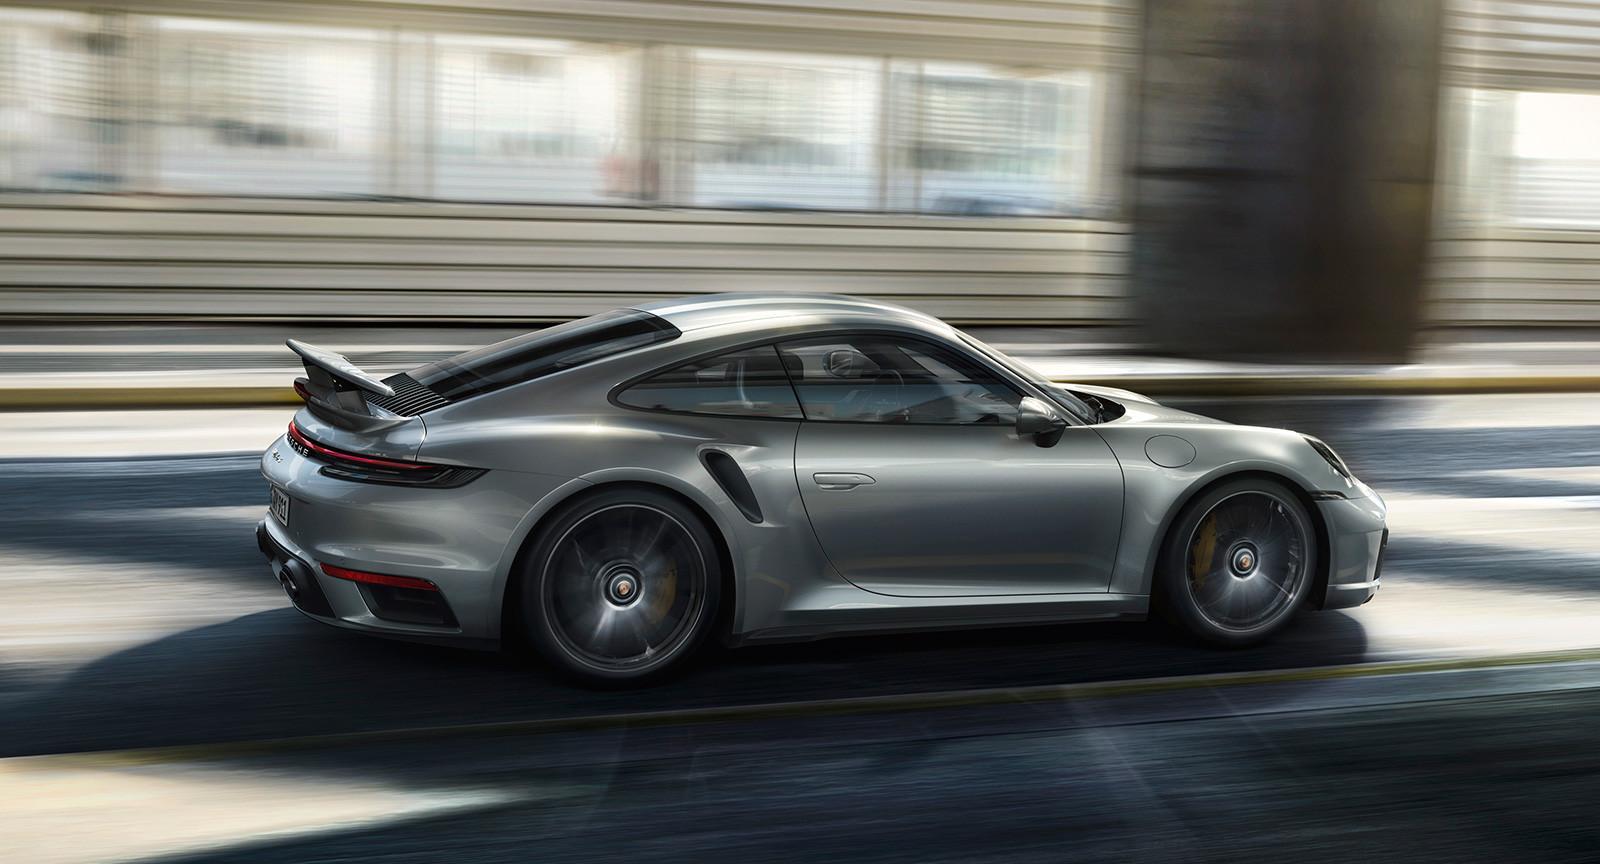 Foto de Porsche 911 Turbo S 2020 (3/18)